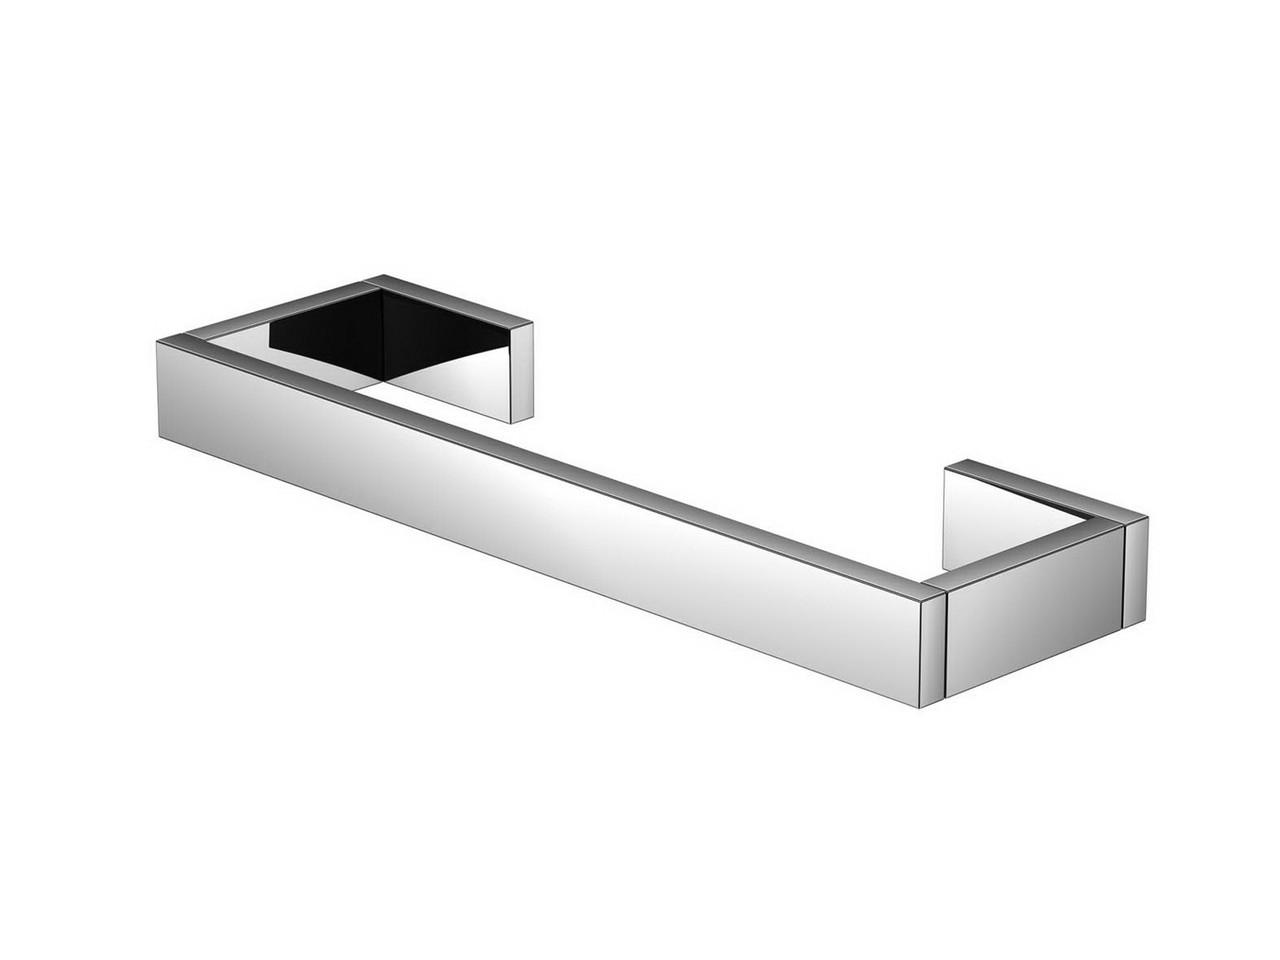 460 2630 Steinberg Serie 460 Поручень для ванны 300мм, из латуни, хром